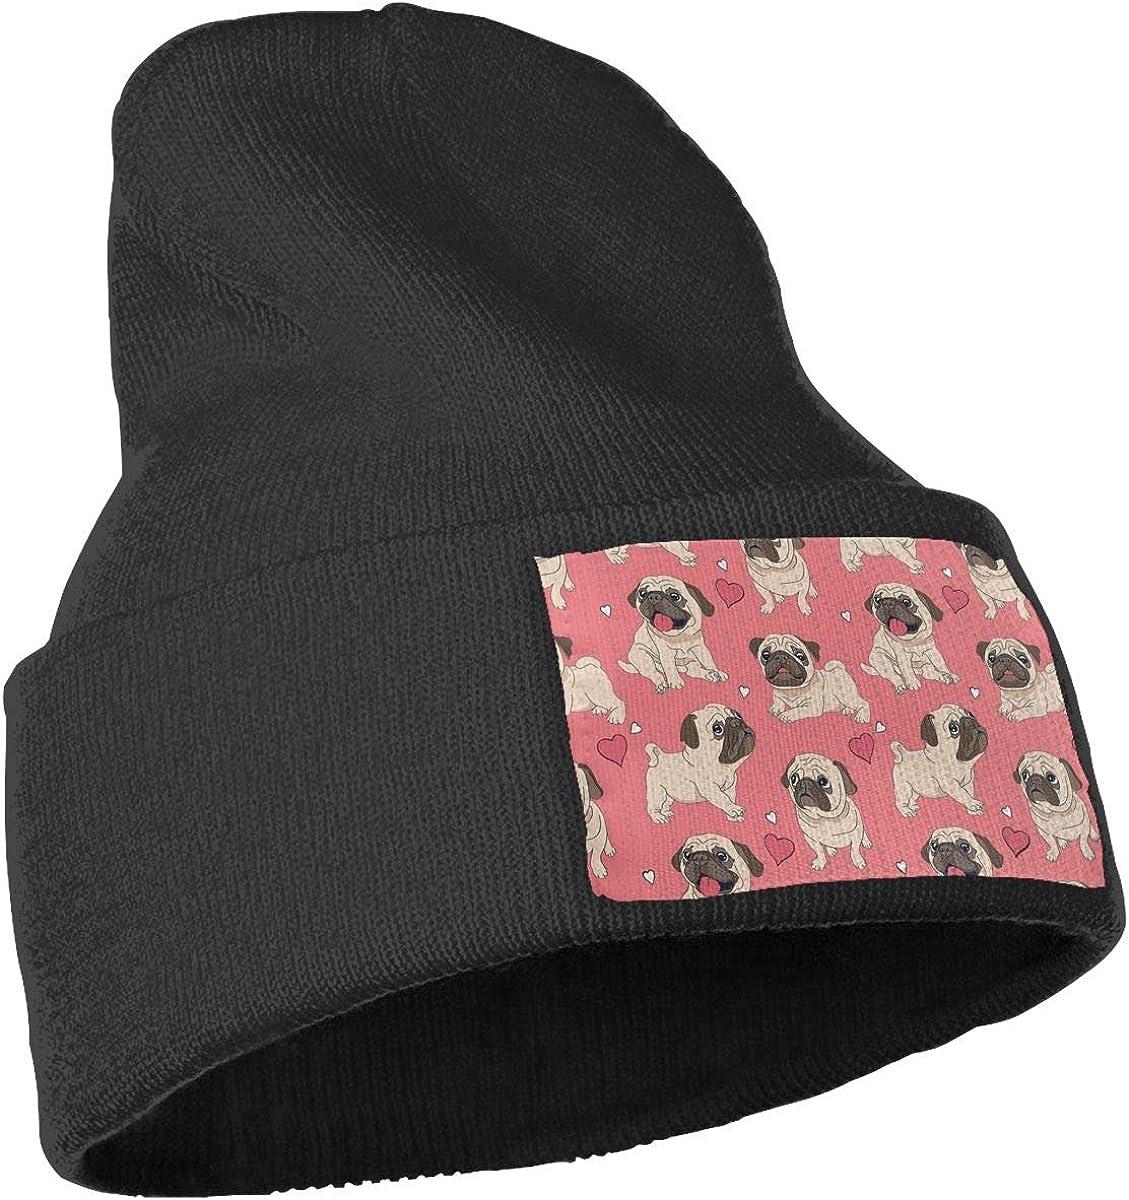 PCaag7v Pug Dog Pink Beanie Hat Winter Solid Warm Knit Unisex Ski Skull Cap